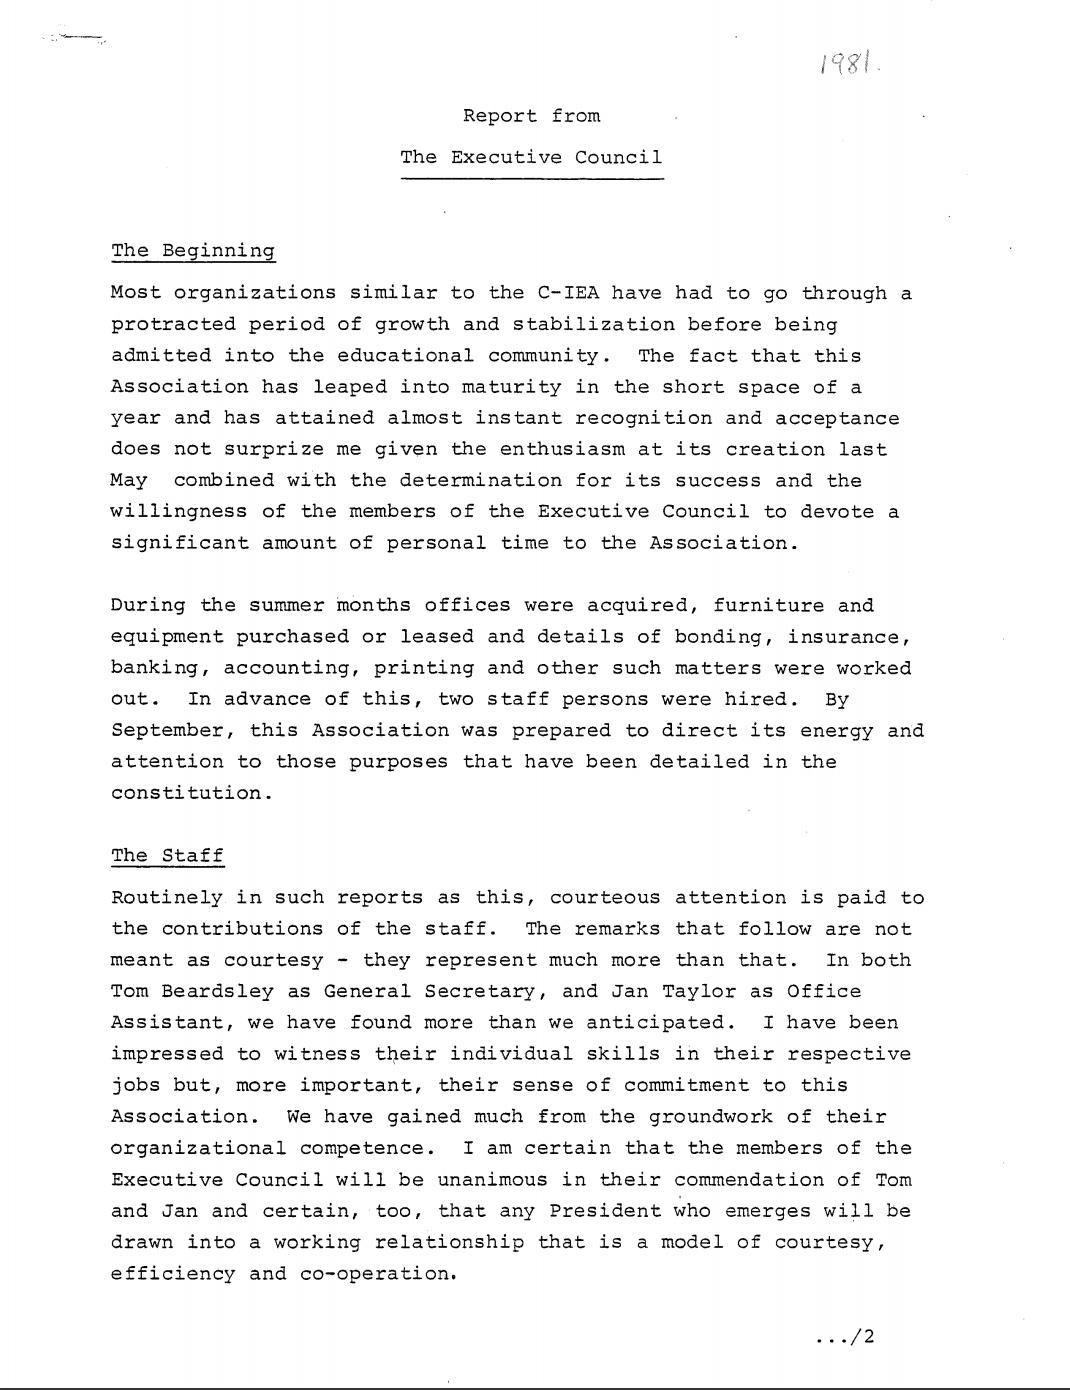 CIEA AGM 1981 President's Report